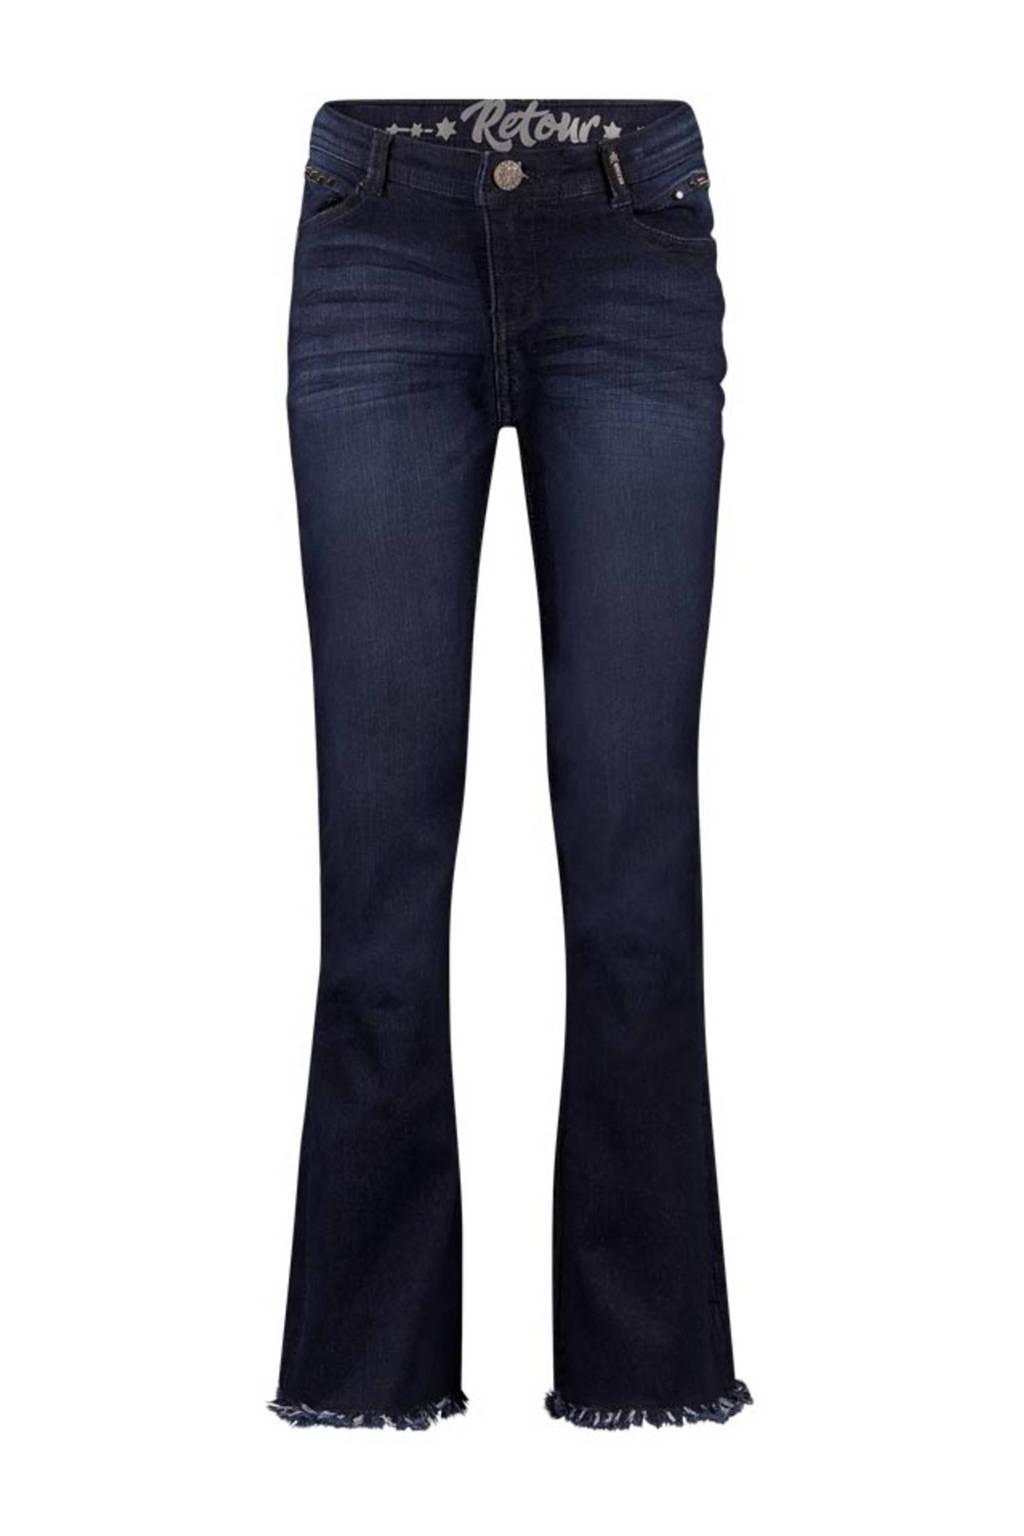 Retour Denim flared jeans Annemiek dark blue denim, Dark blue denim